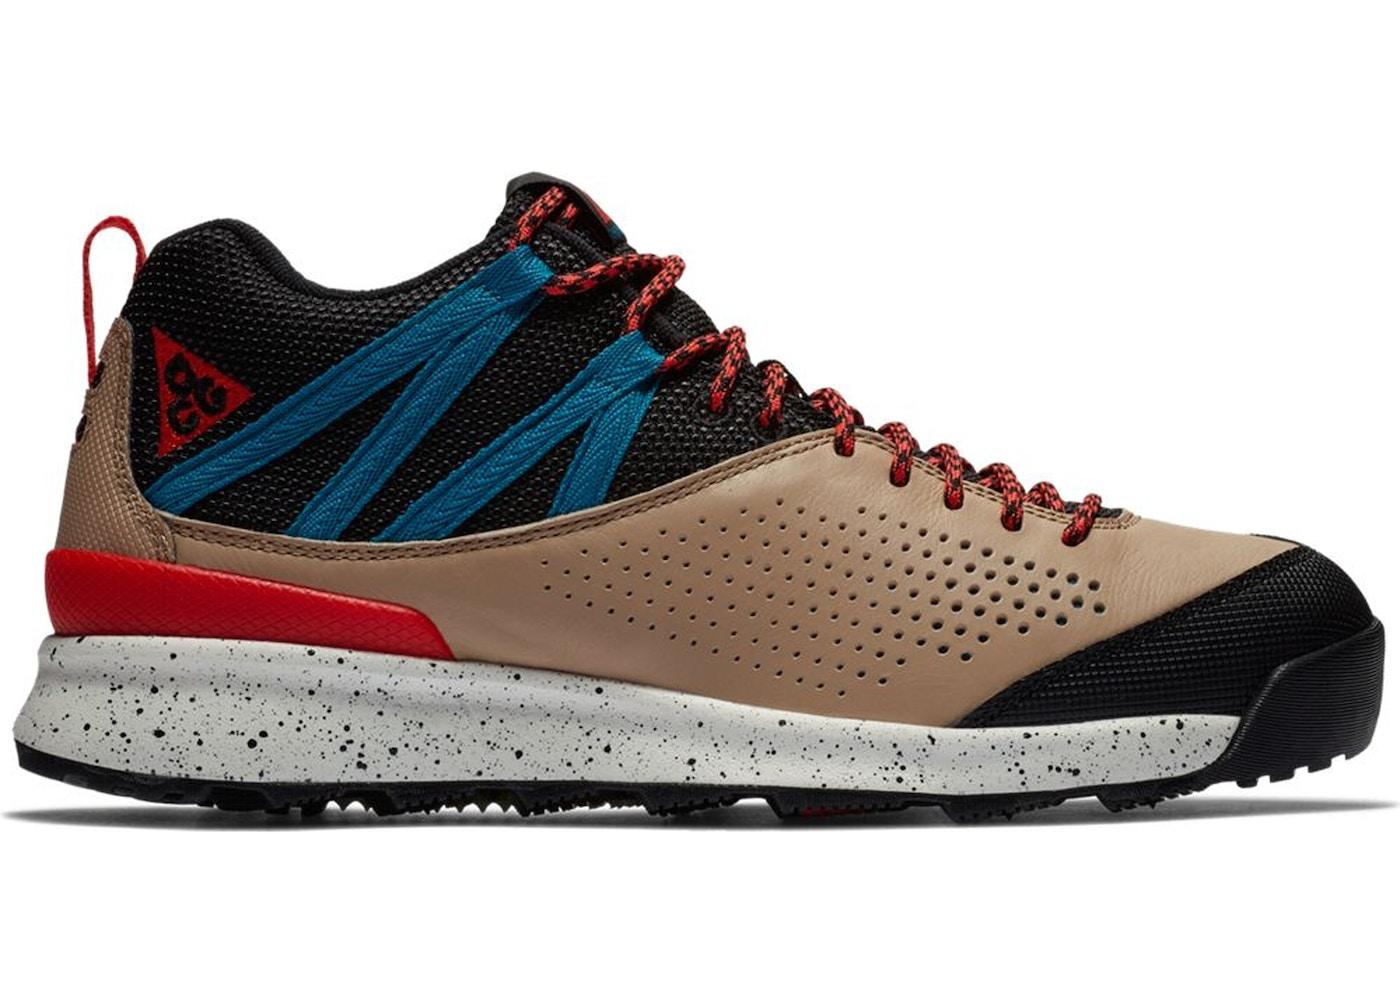 primavera golondrina color  Nike ACG Okwahn 2 Desert - 525367-200